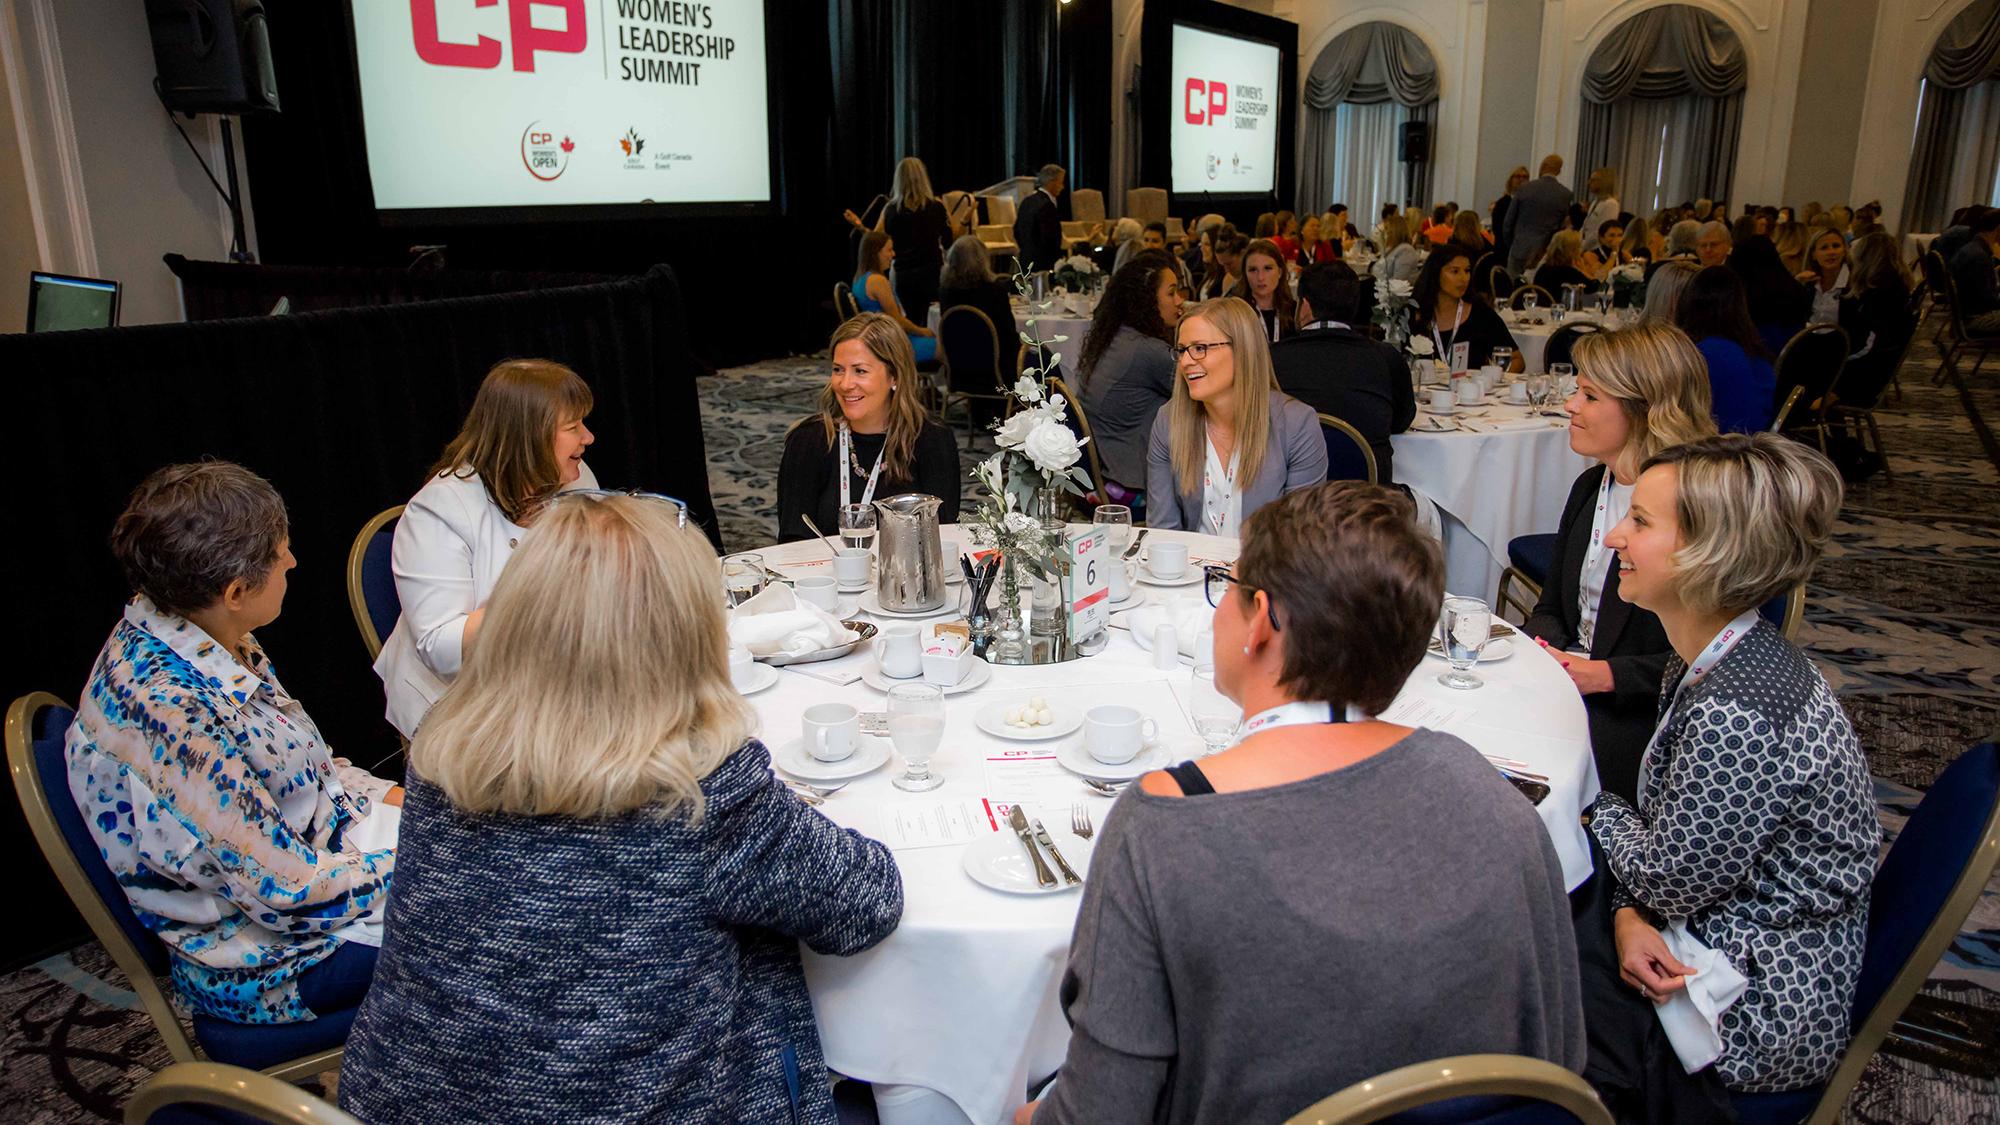 CP Women's Leadership Summit